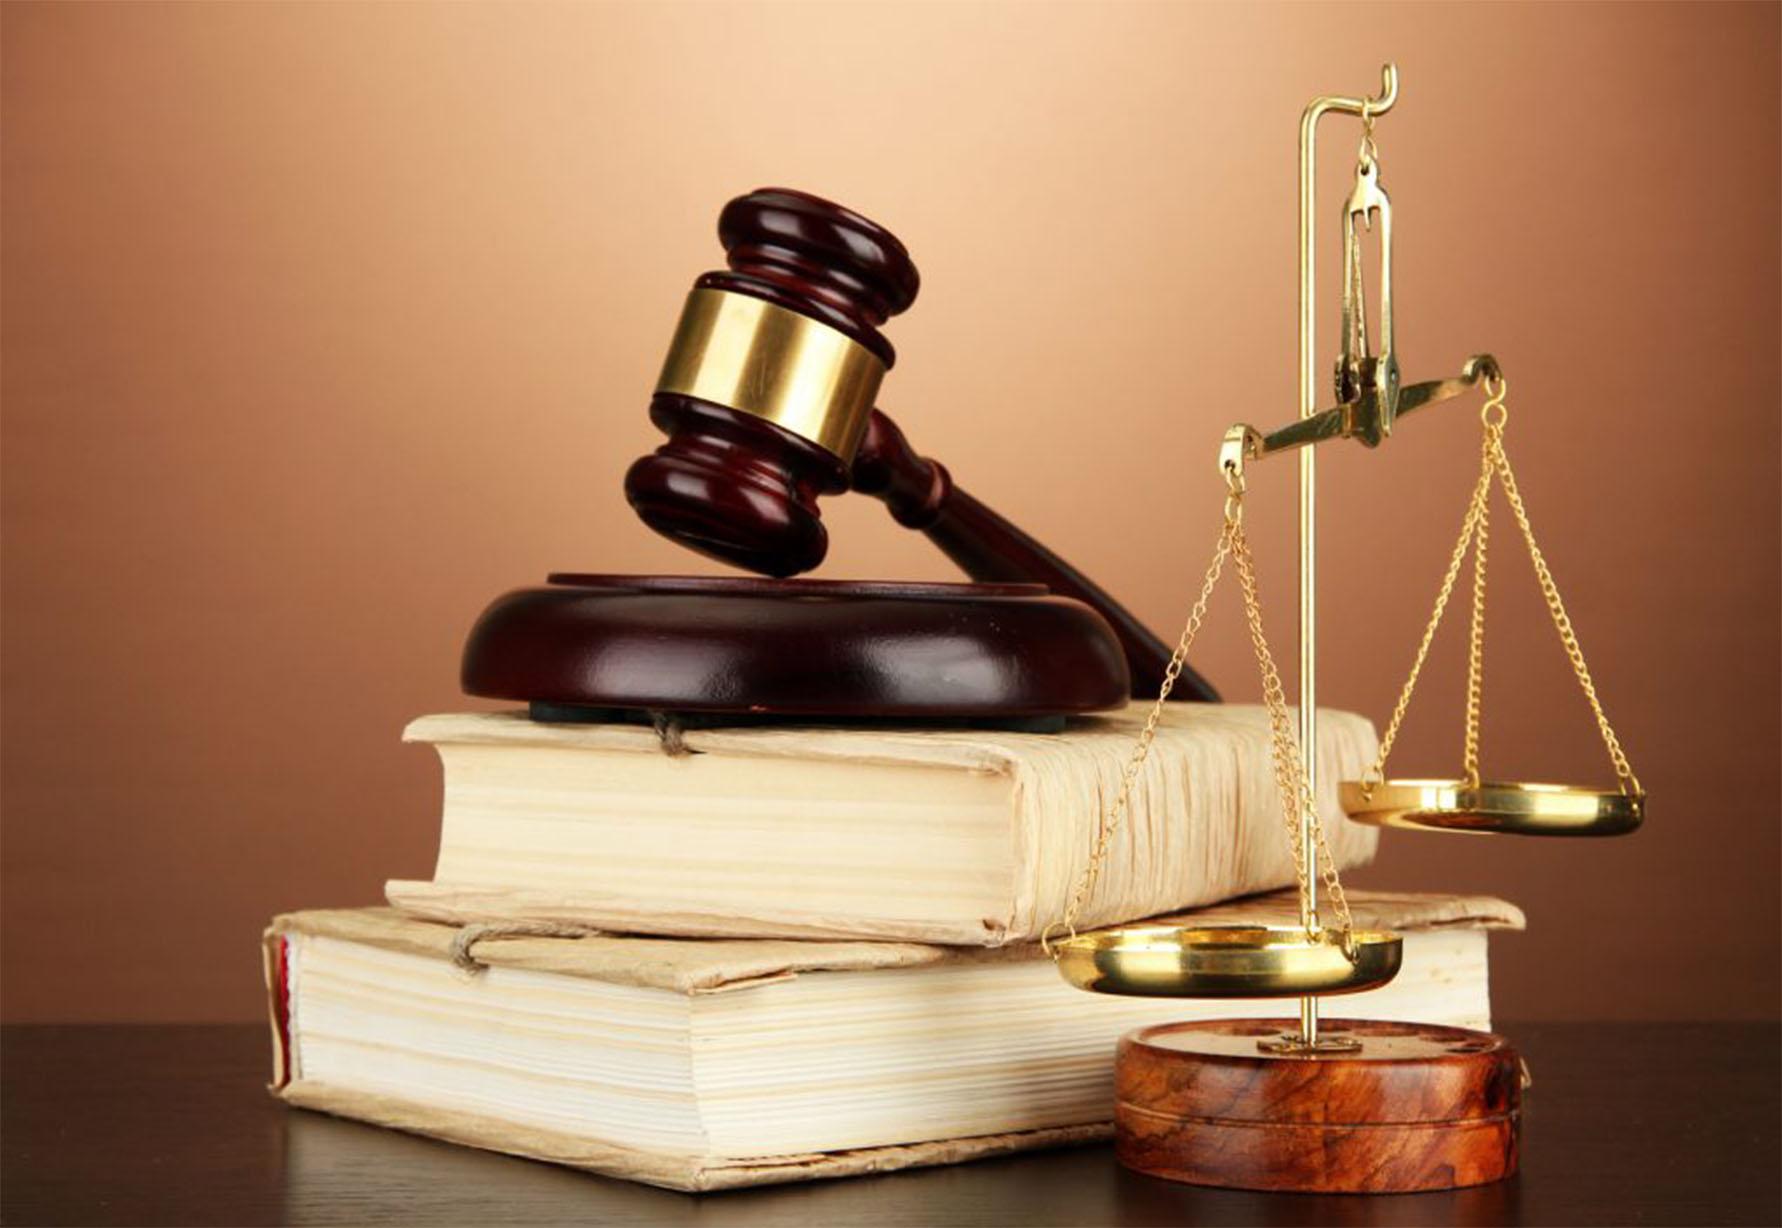 Картинки про закон и порядок